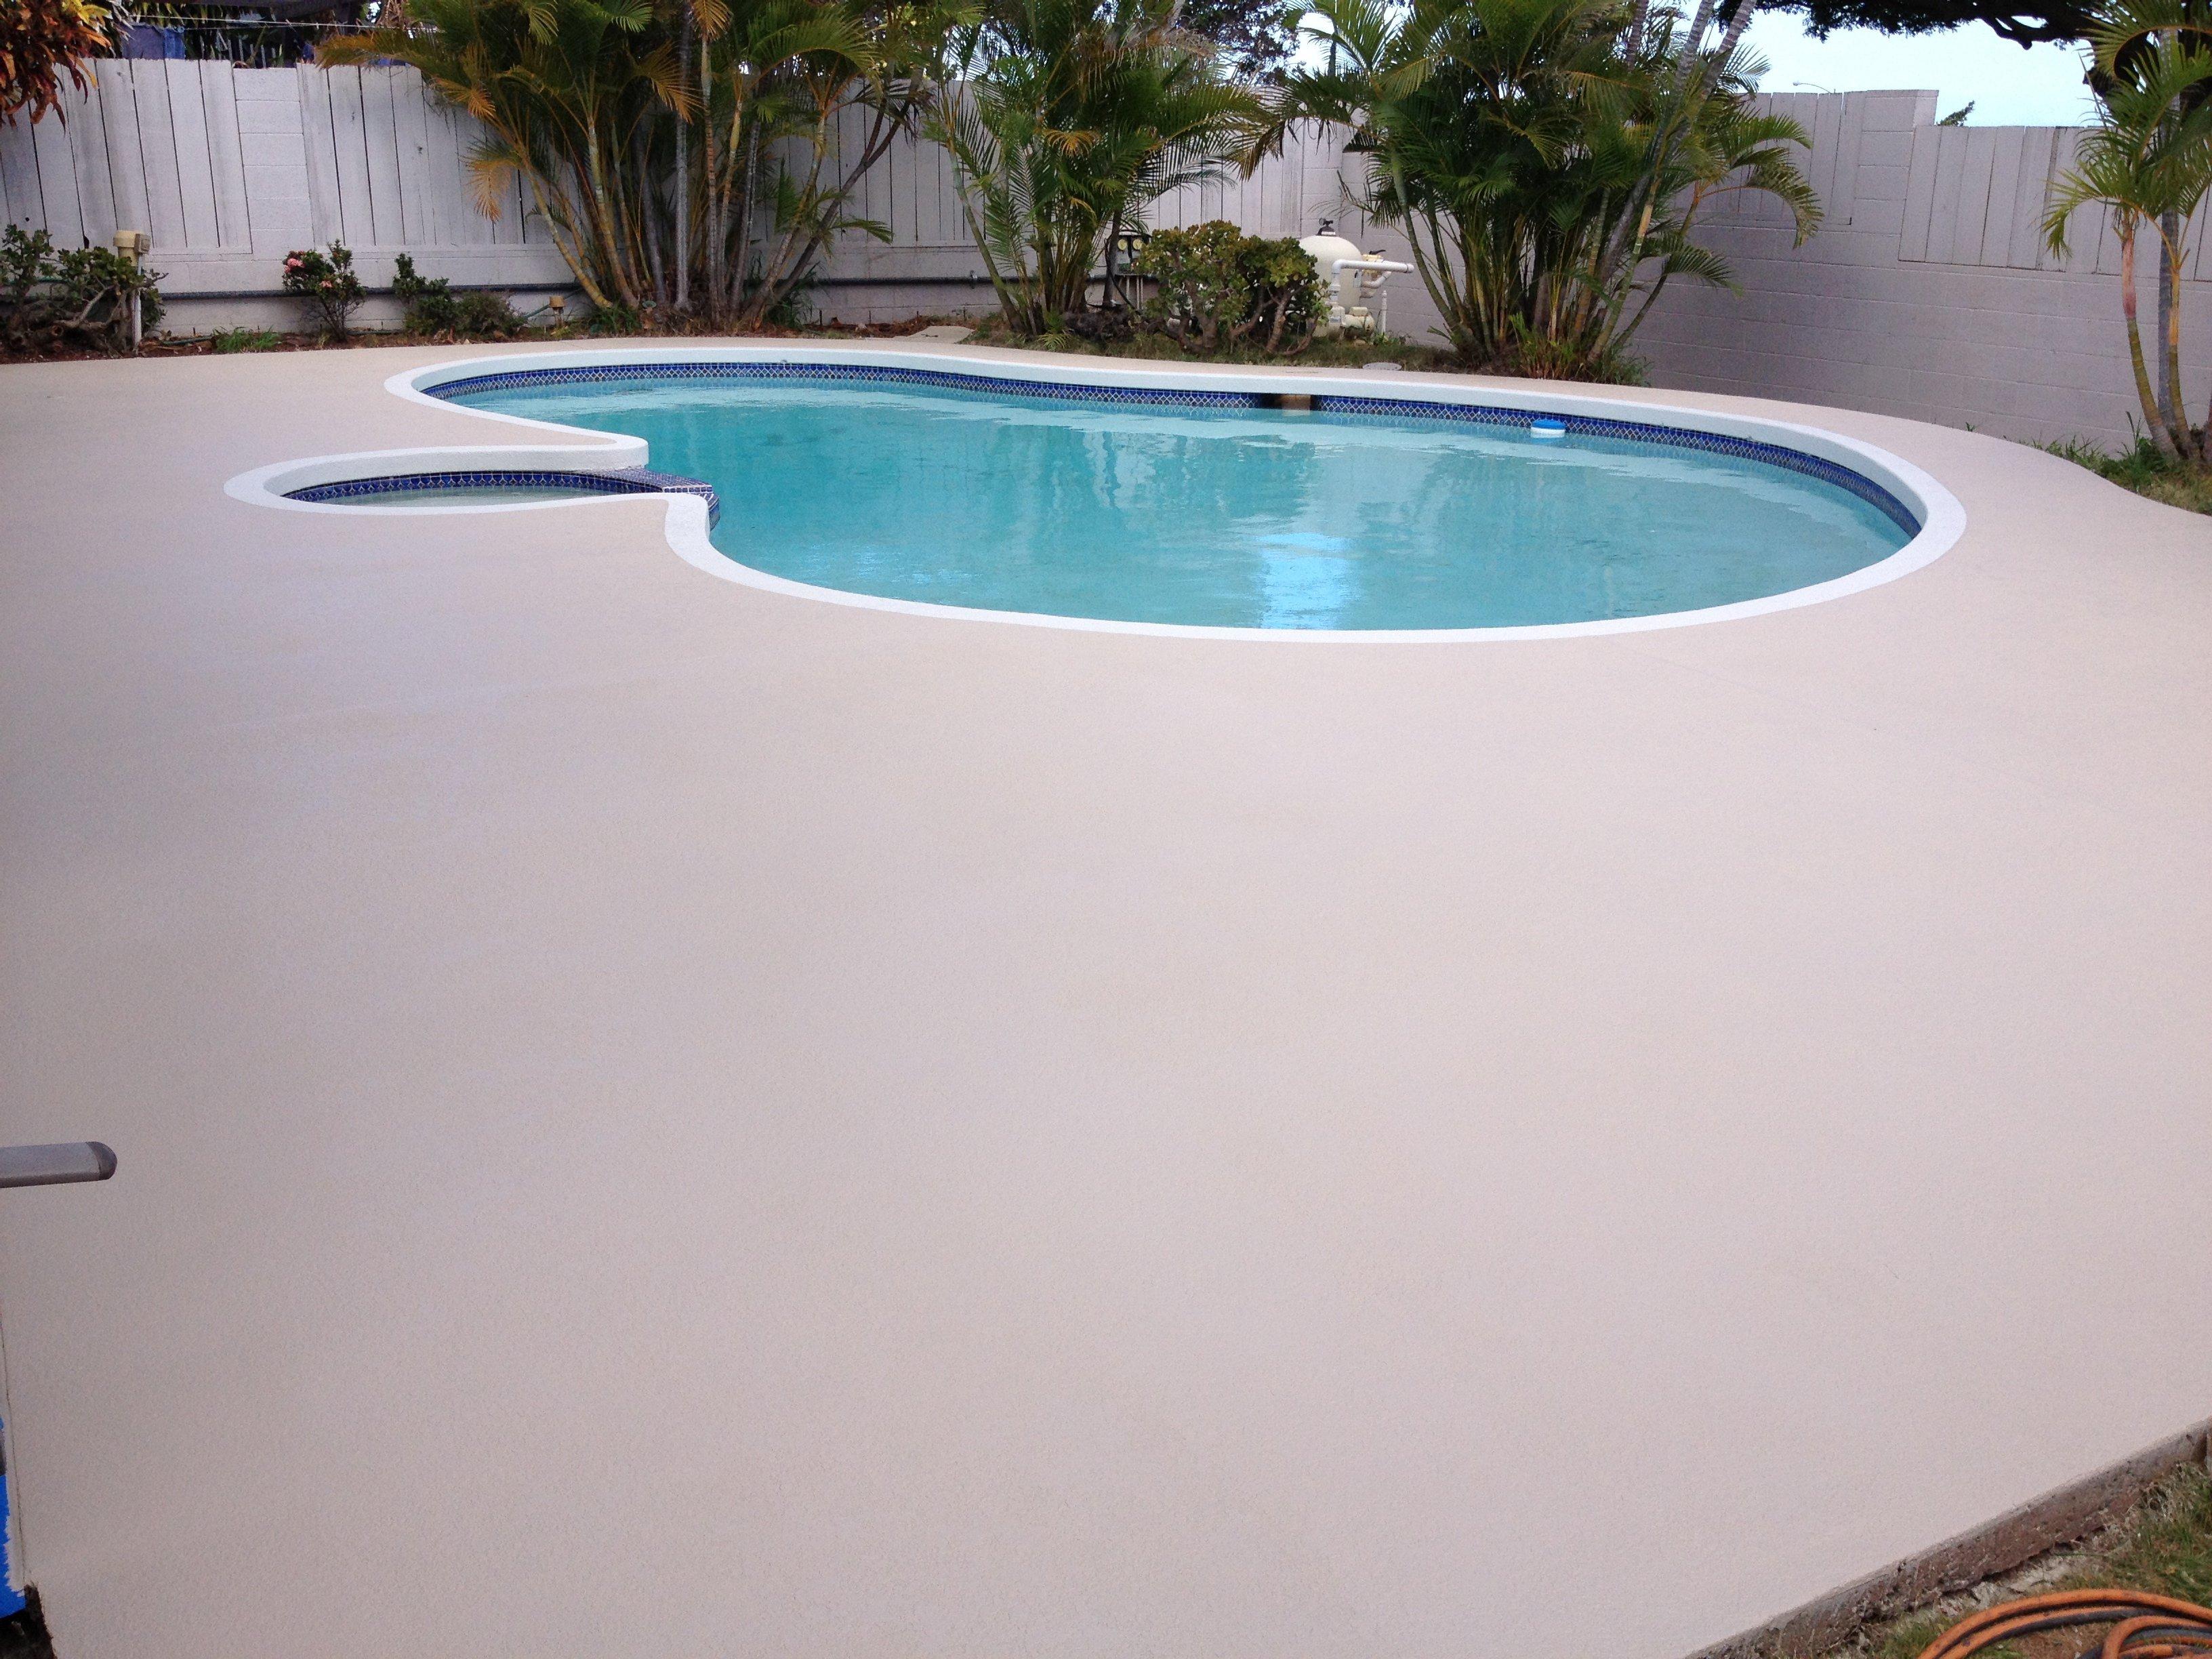 Concrete Swimming Pool Contractor Waterproof Coating